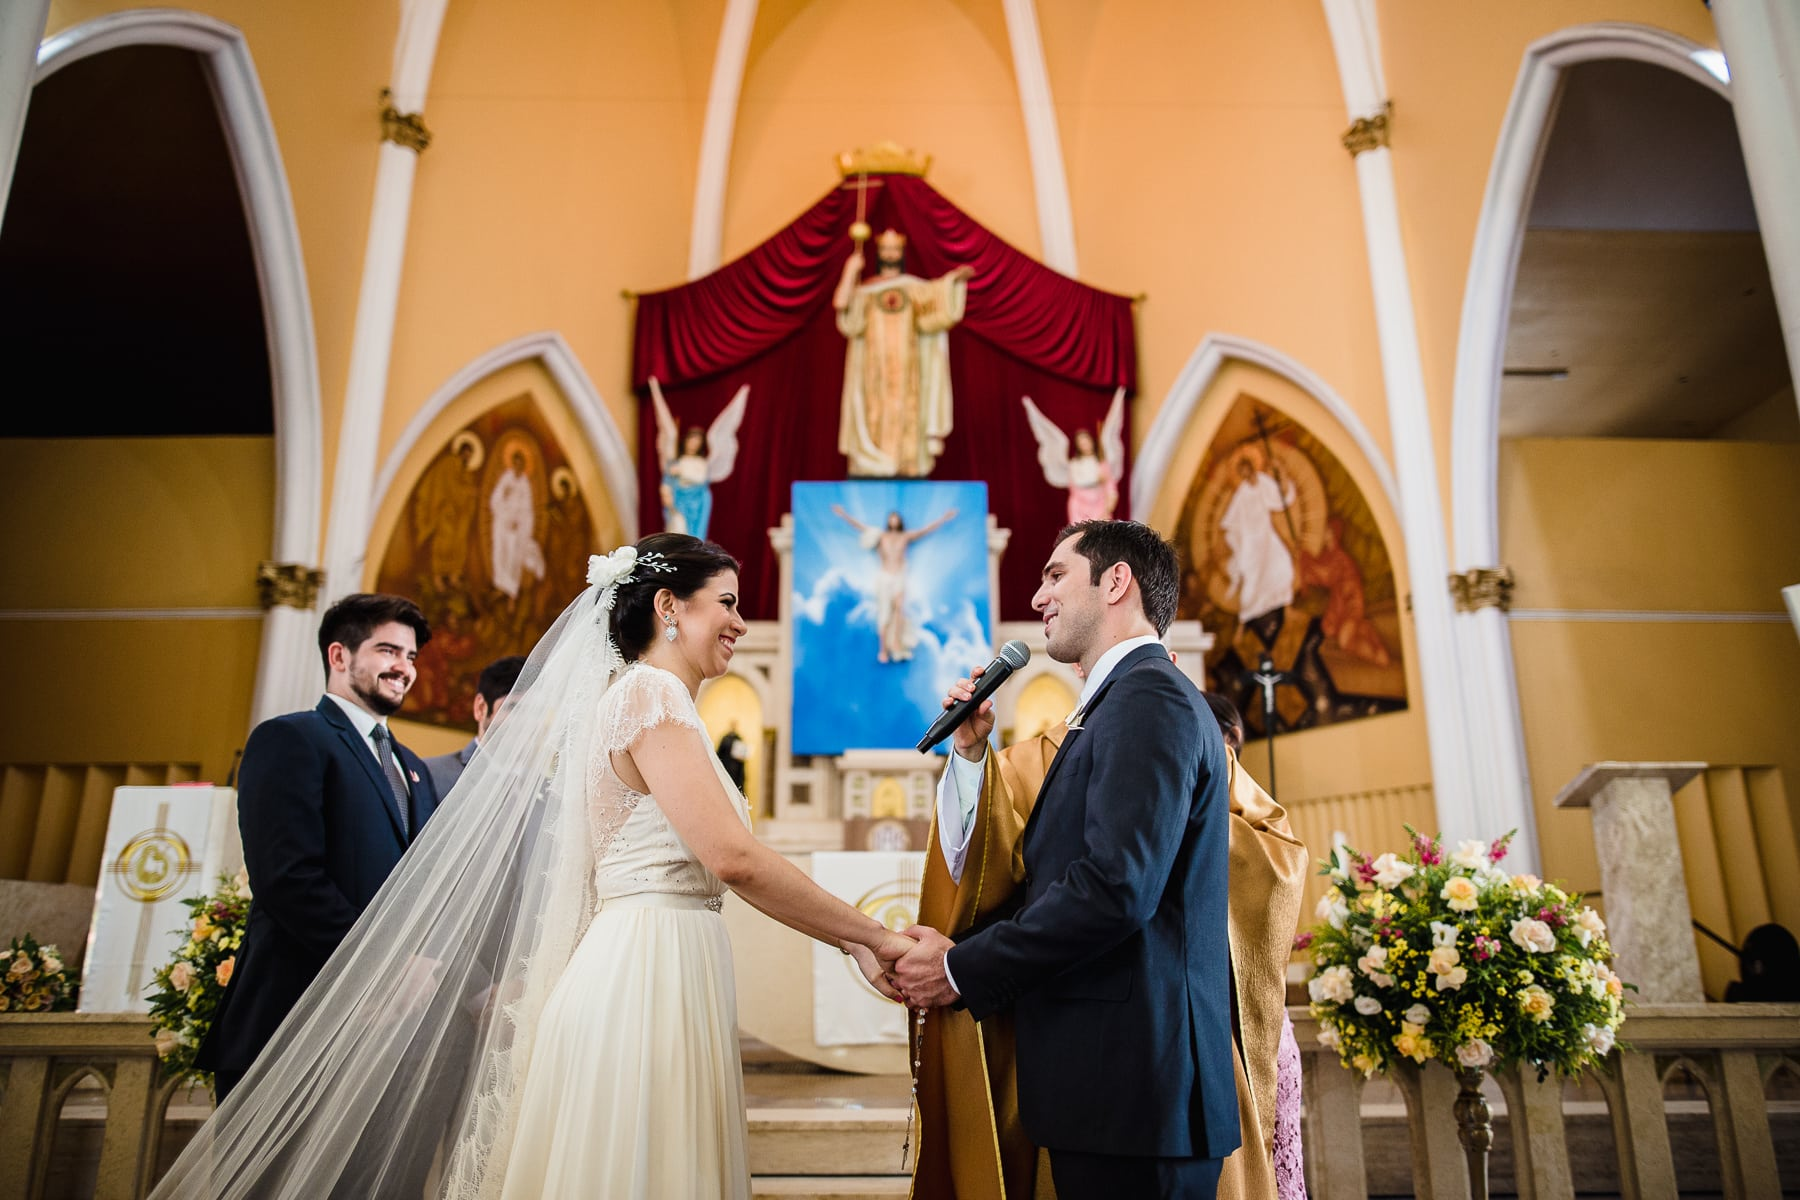 casamento-igreja-do-cristo-rei-fortaleza-41